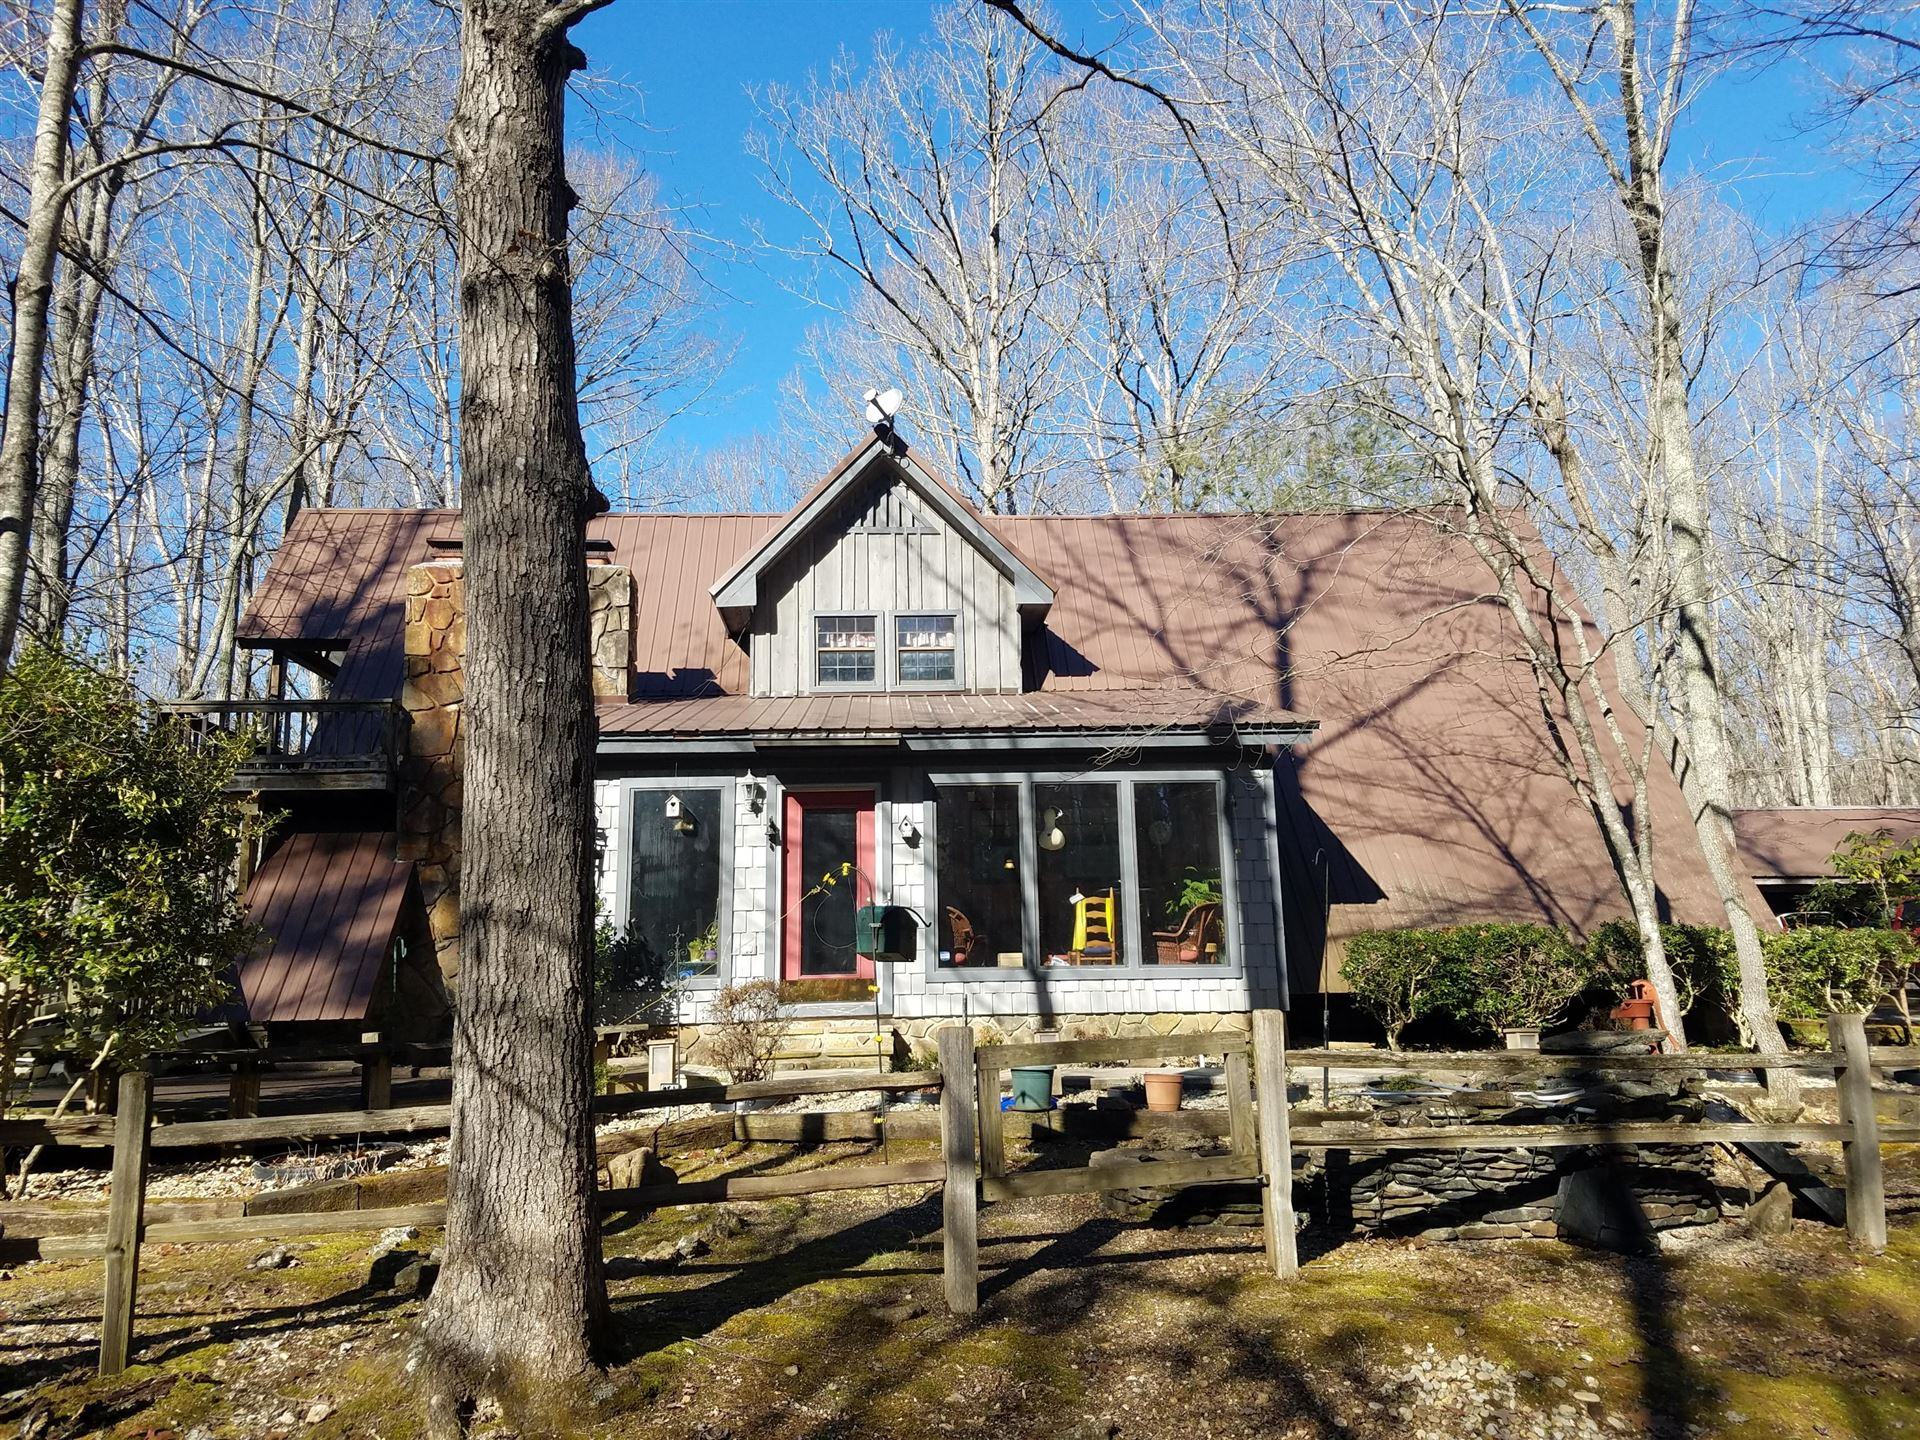 Photo of 188 Hickory Hollow Rd, Kingston, TN 37763 (MLS # 1143754)